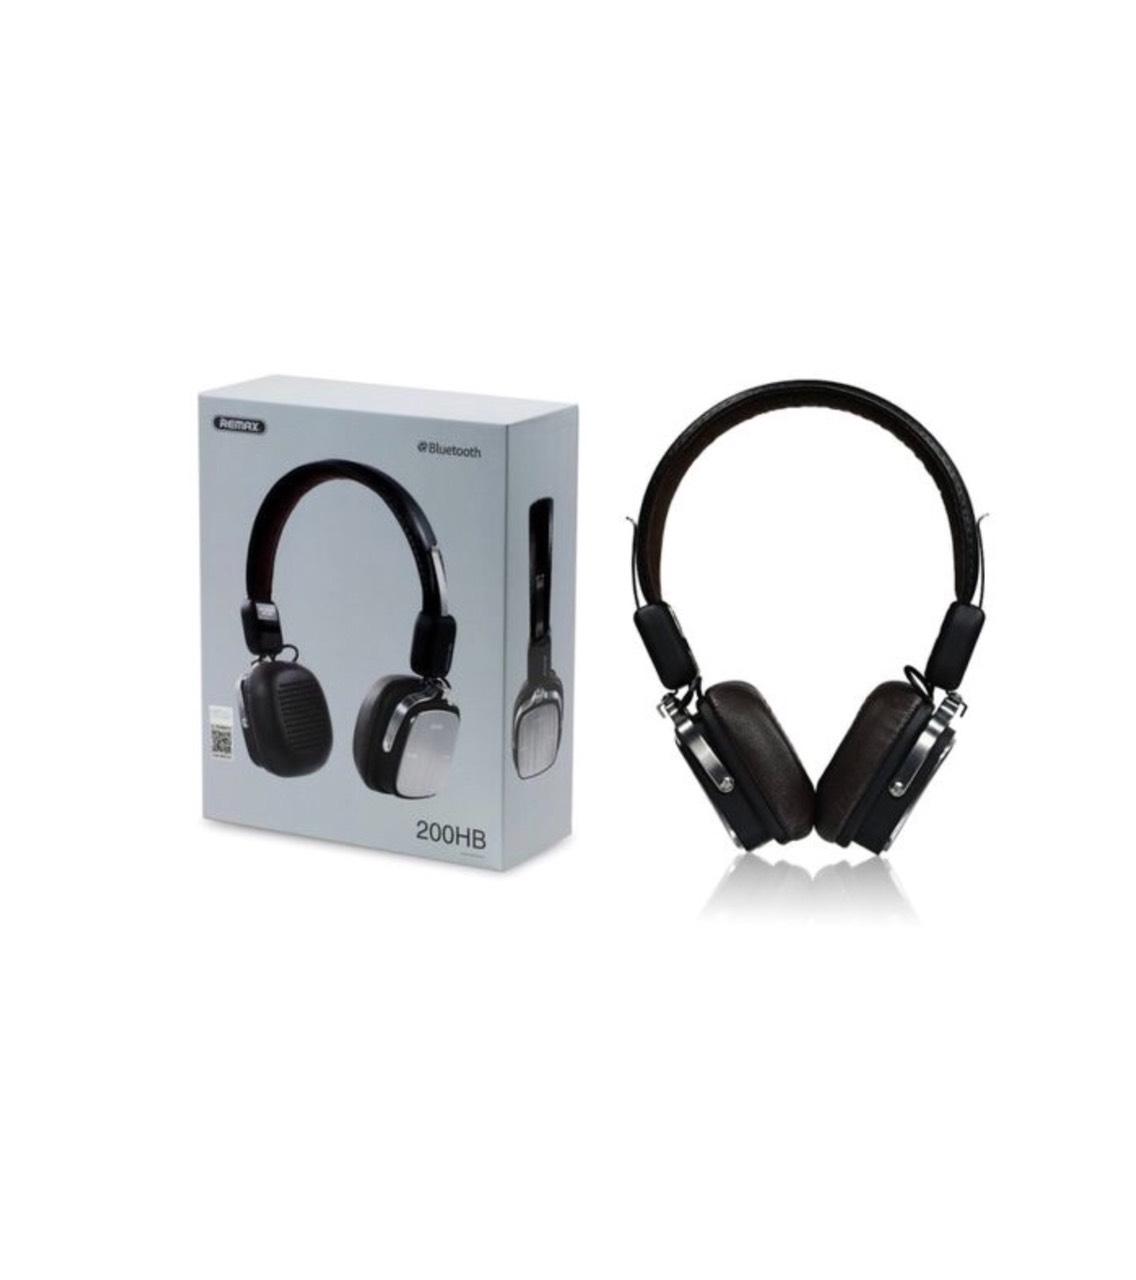 Tai Nghe HEADSET Bluetooth Remax 200HB